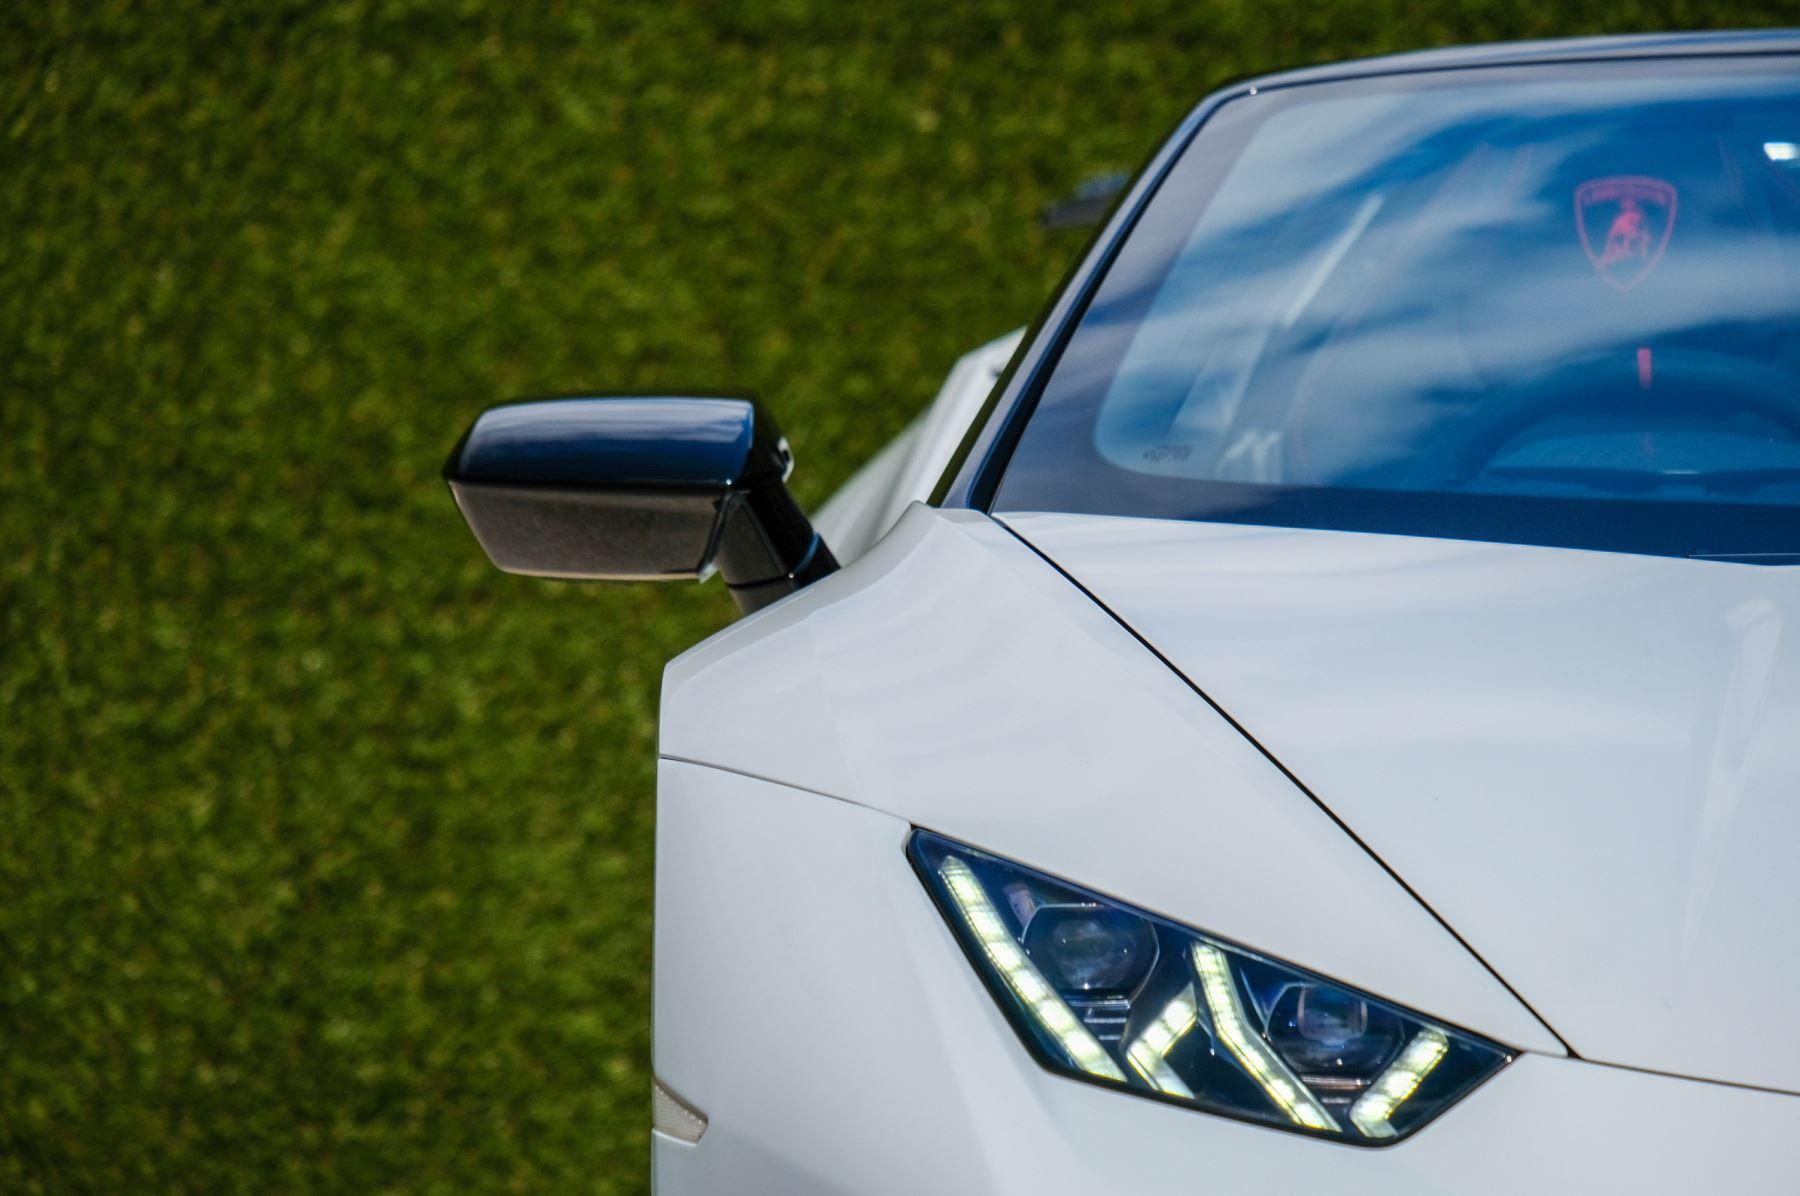 Lamborghini Huracan Performante Spyder 5.2 V10 AWD image 10